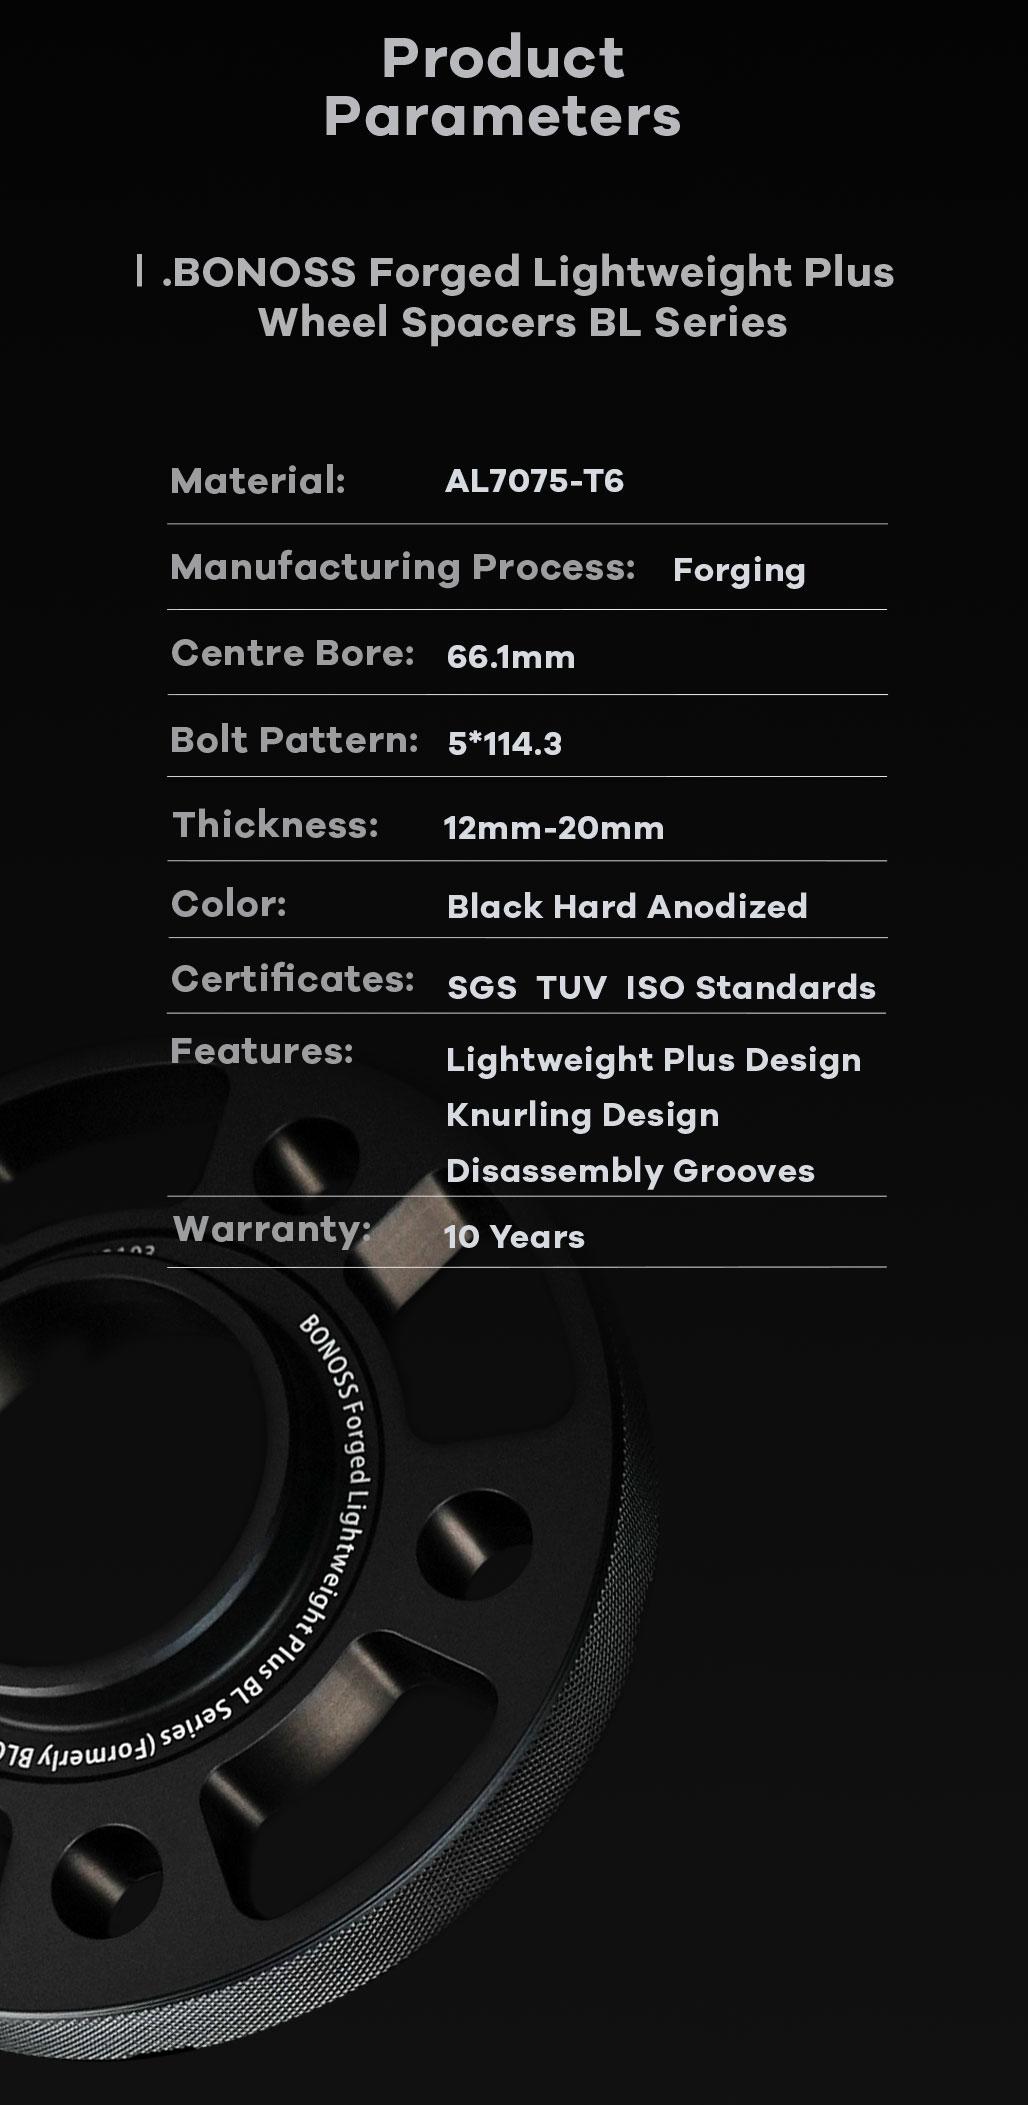 BONOSS-forged-lightweight-plus-wheel-spacer-Opel-Vivaro-B-5x114.3-66.1-M14x1.5-7075T6-by-grace-1